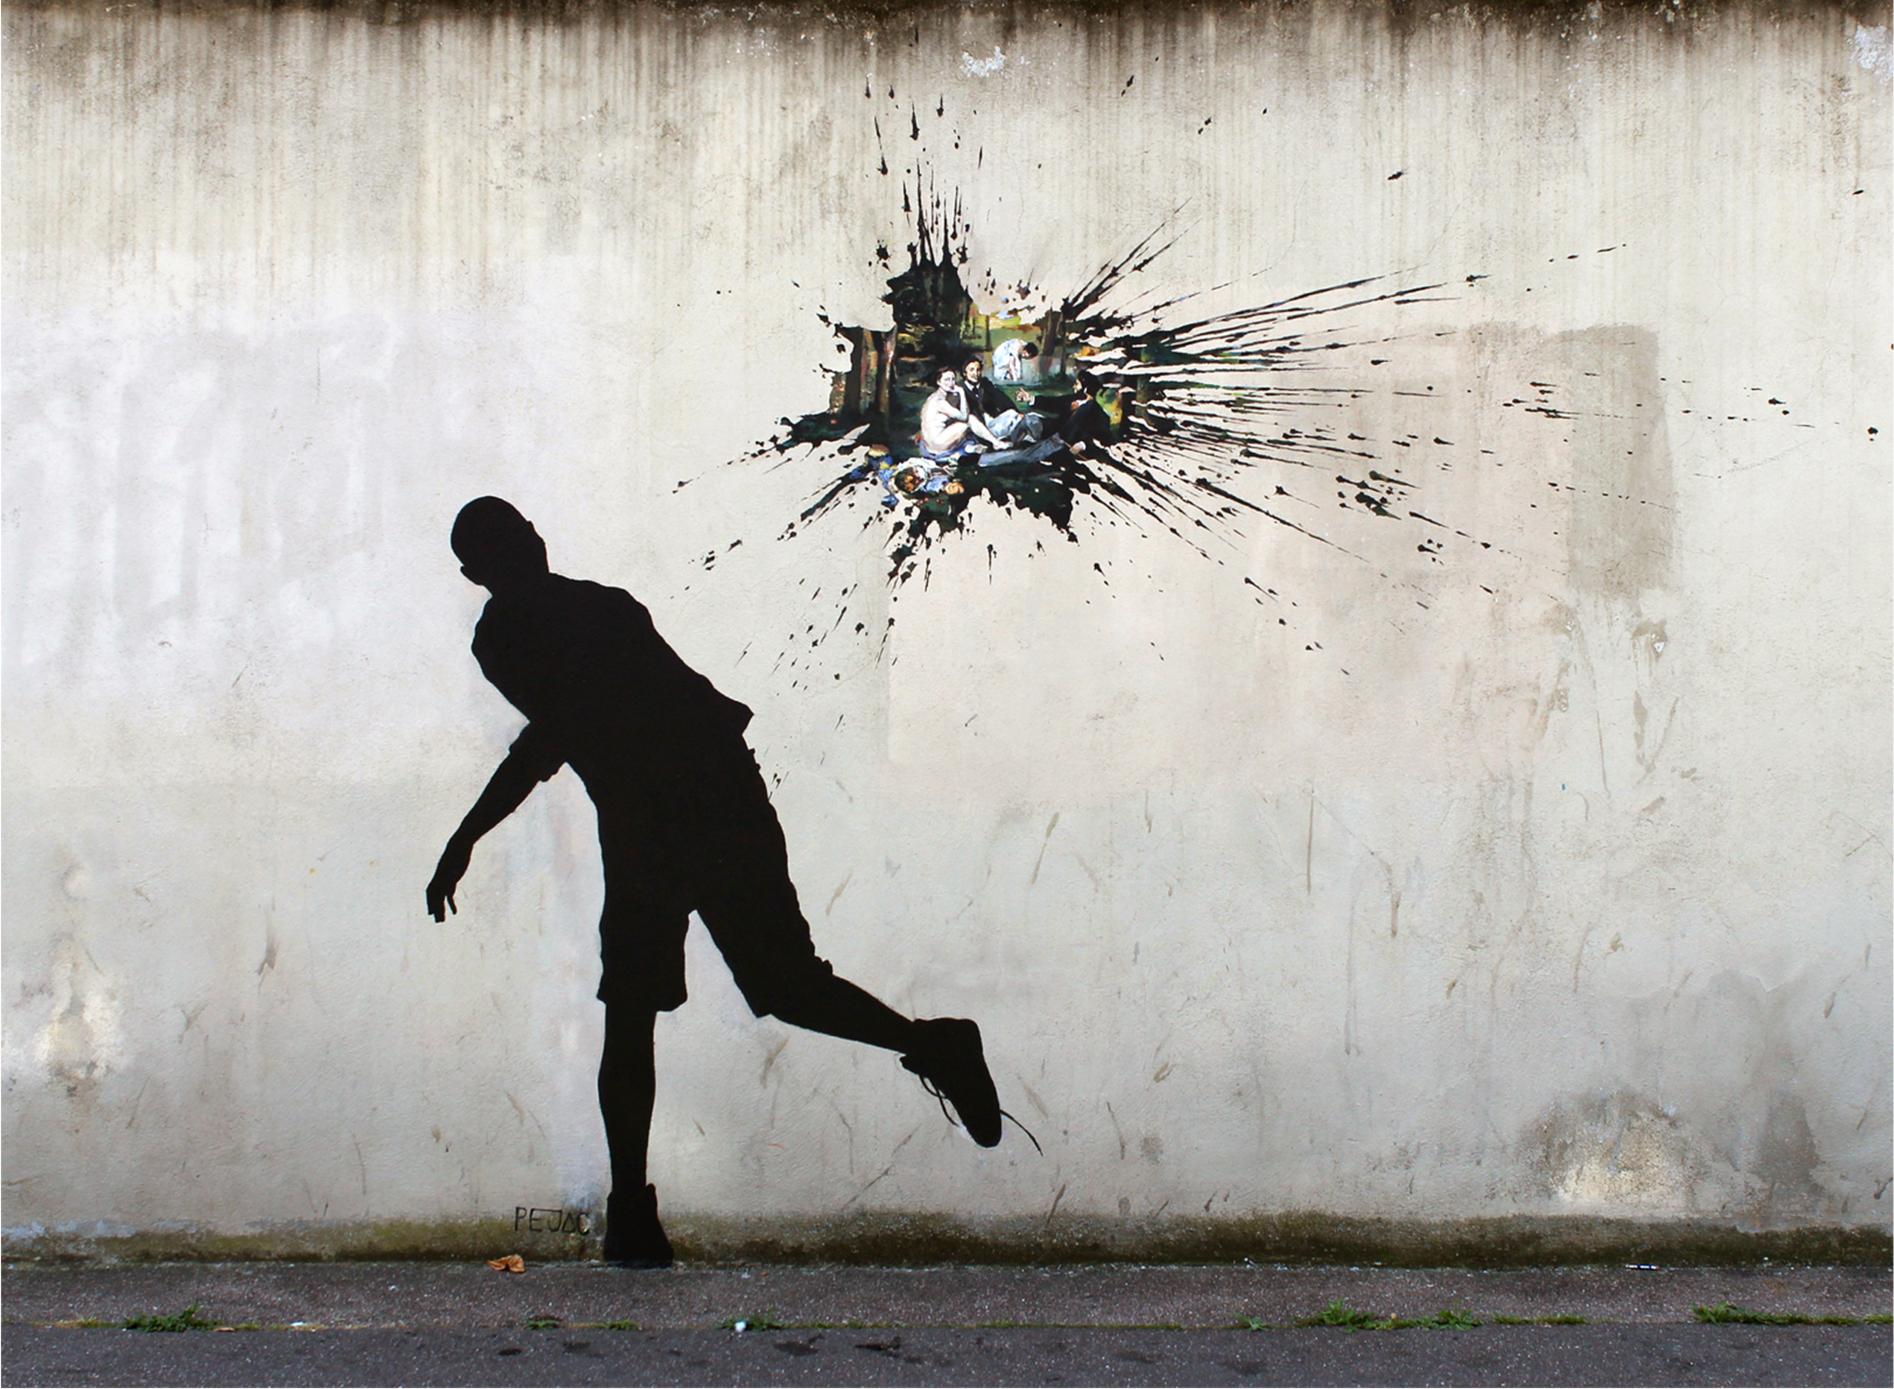 pejac-social-arte-graffiti-de-rua-2